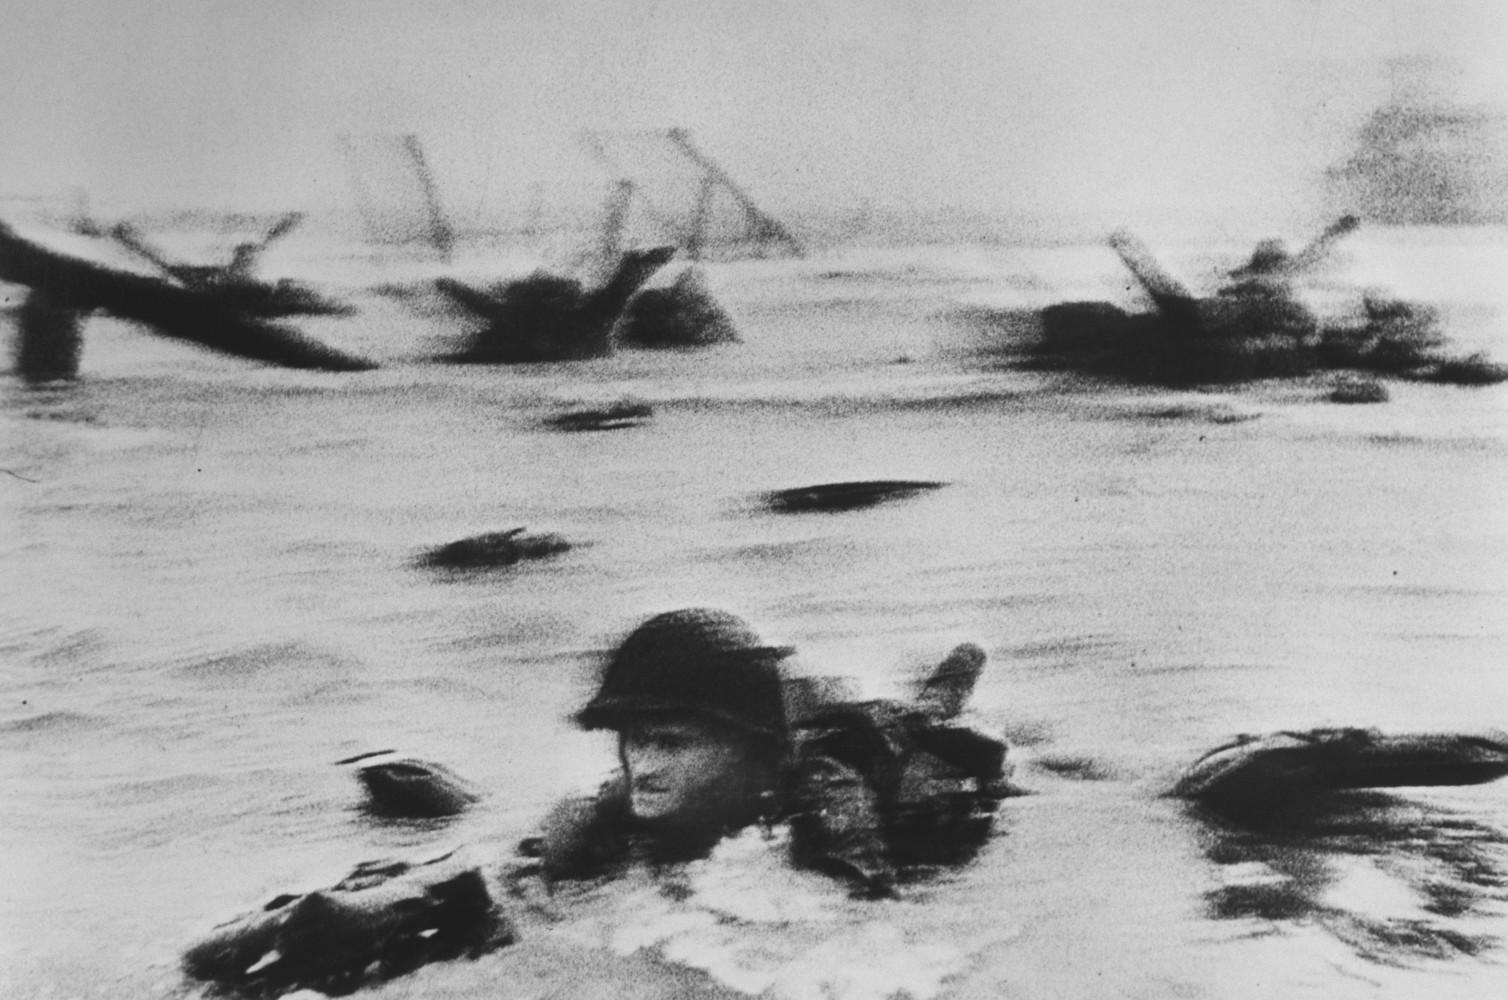 D-Day and the Omaha Beach landings • Robert Capa • Magnum Photos